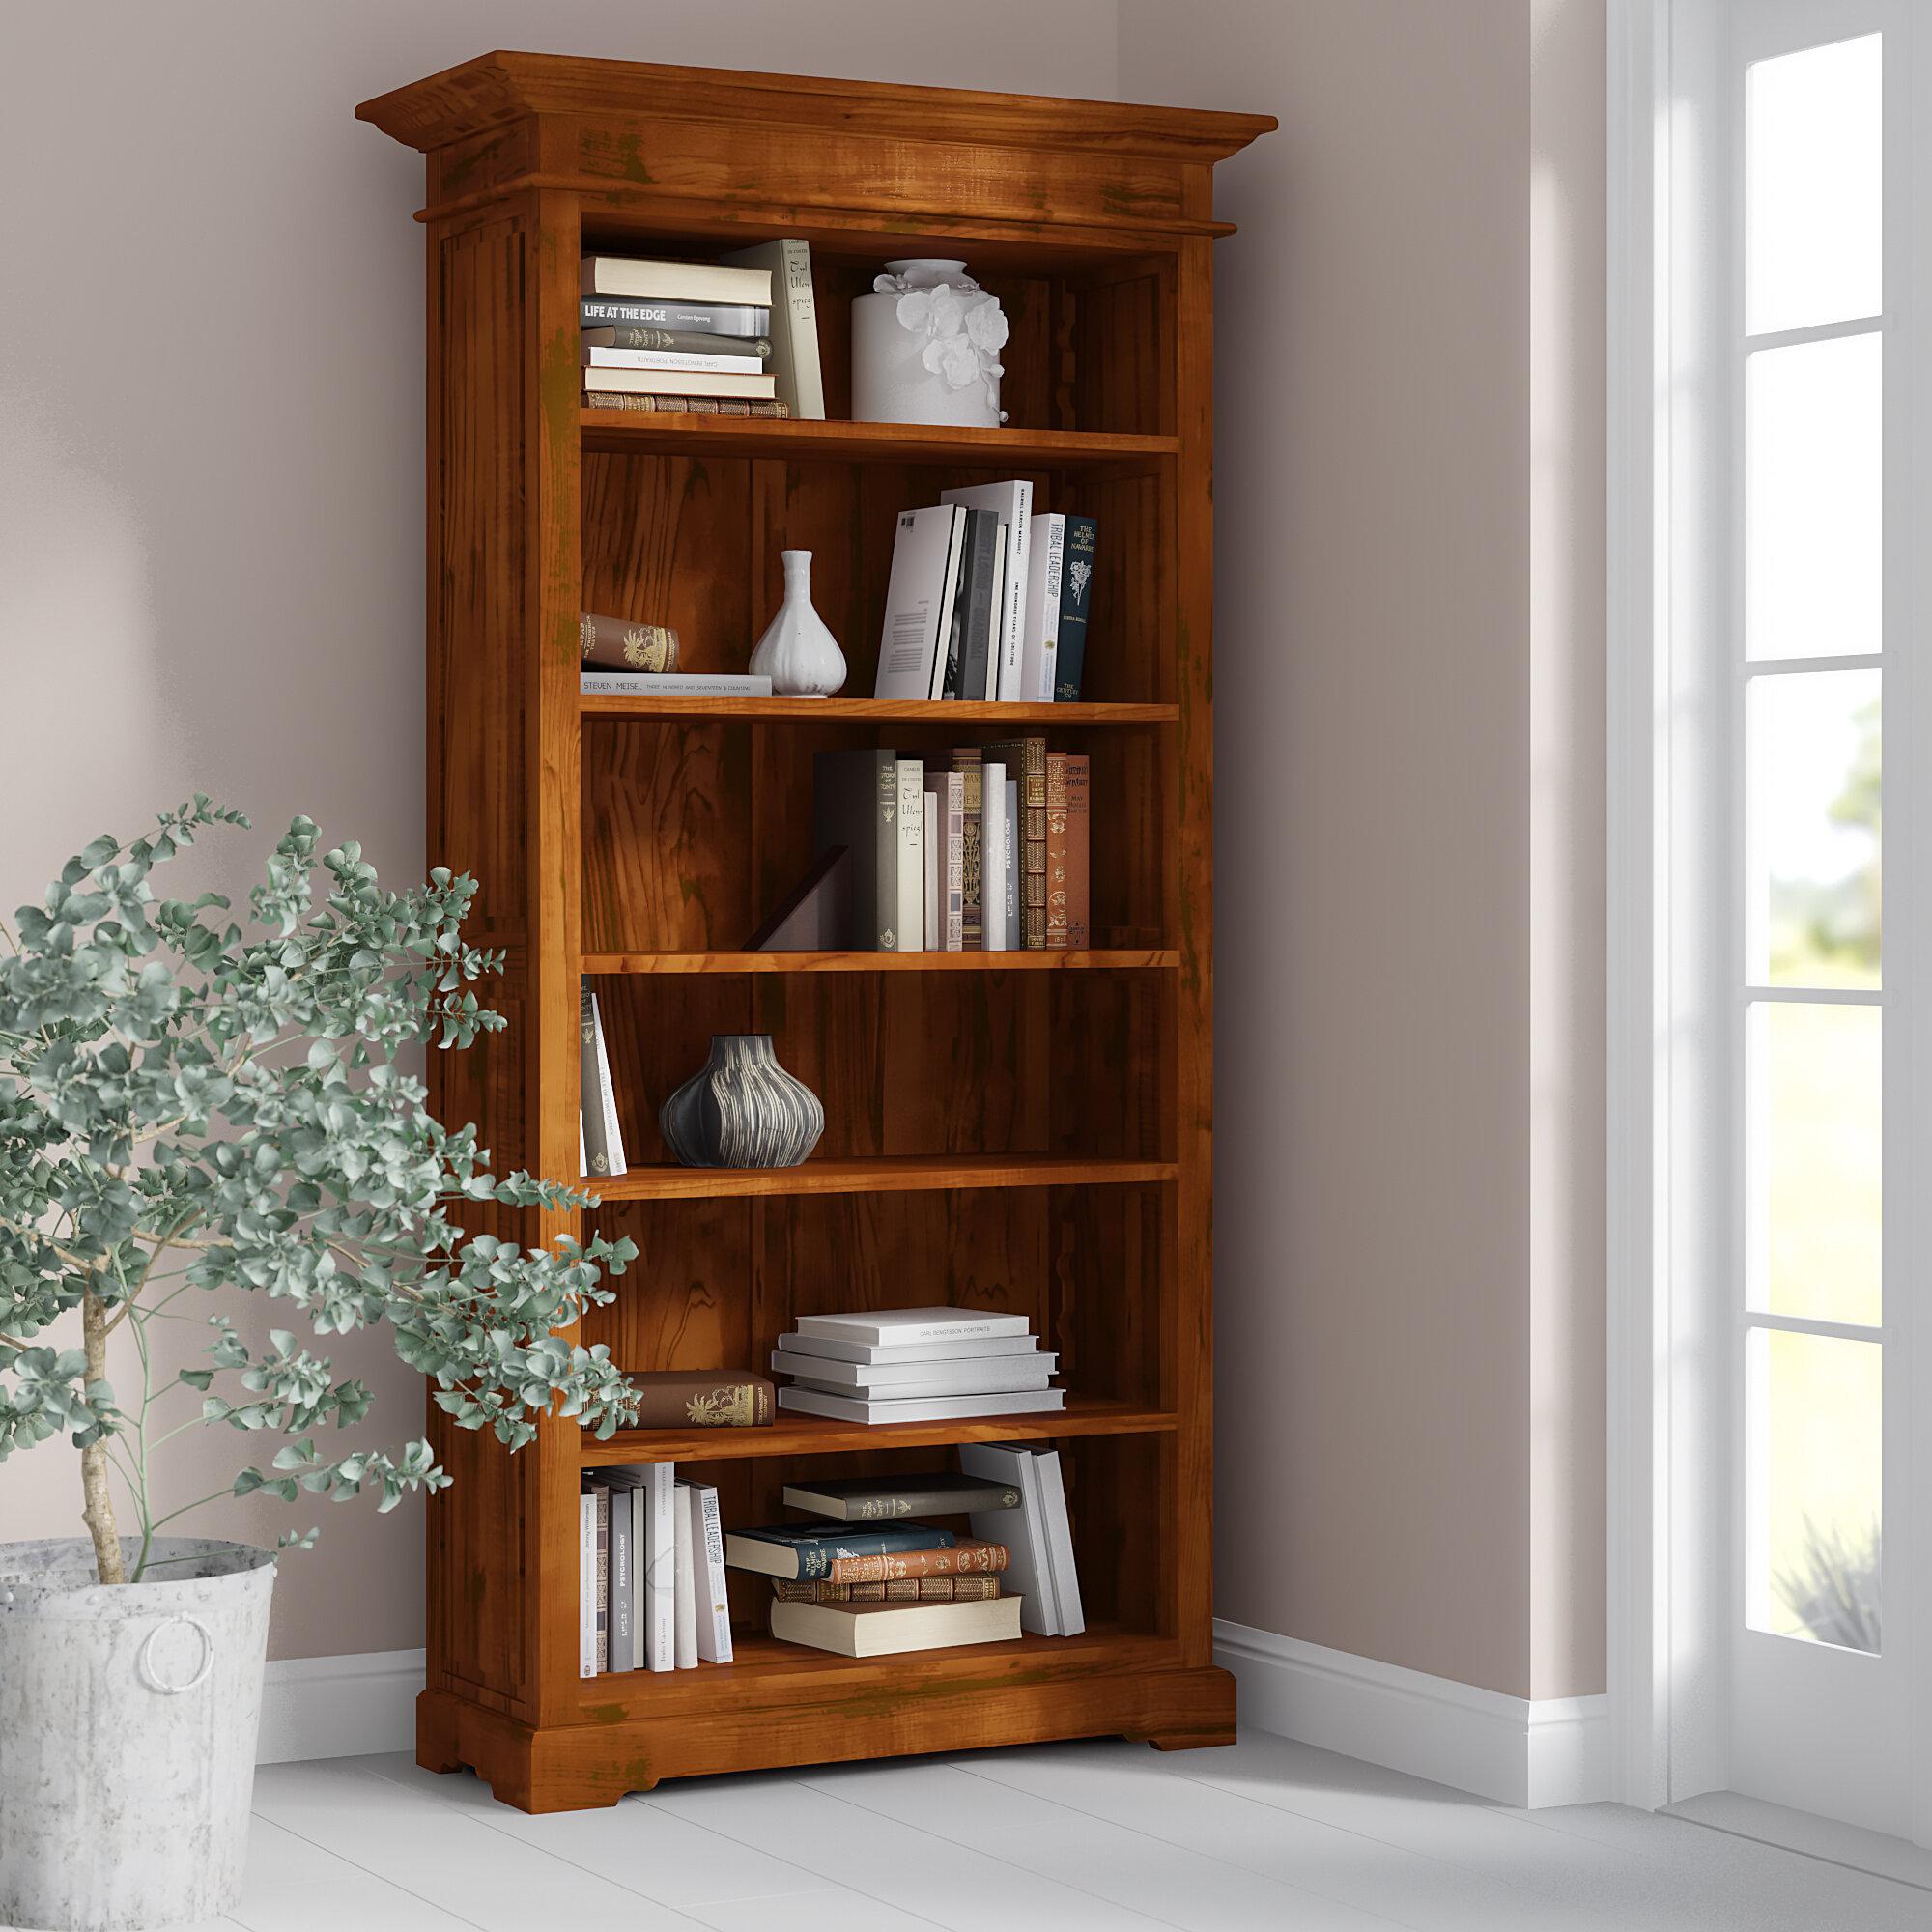 Adlington Solid Wood Bookcase